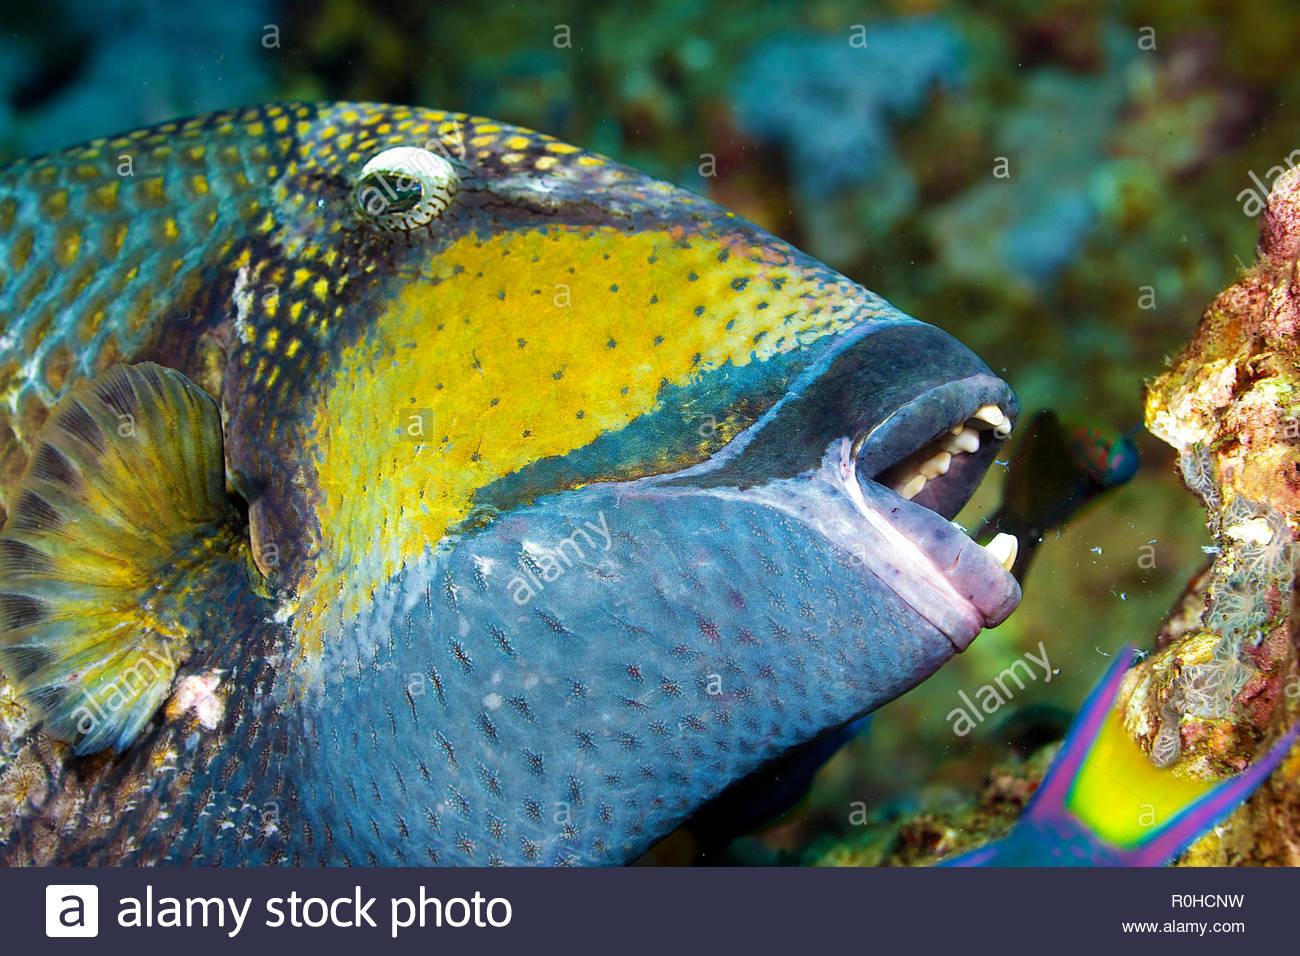 Titan triggerfish (Balistoides viridescens), portrait, Ari Atoll, Maledive islands - Stock Image